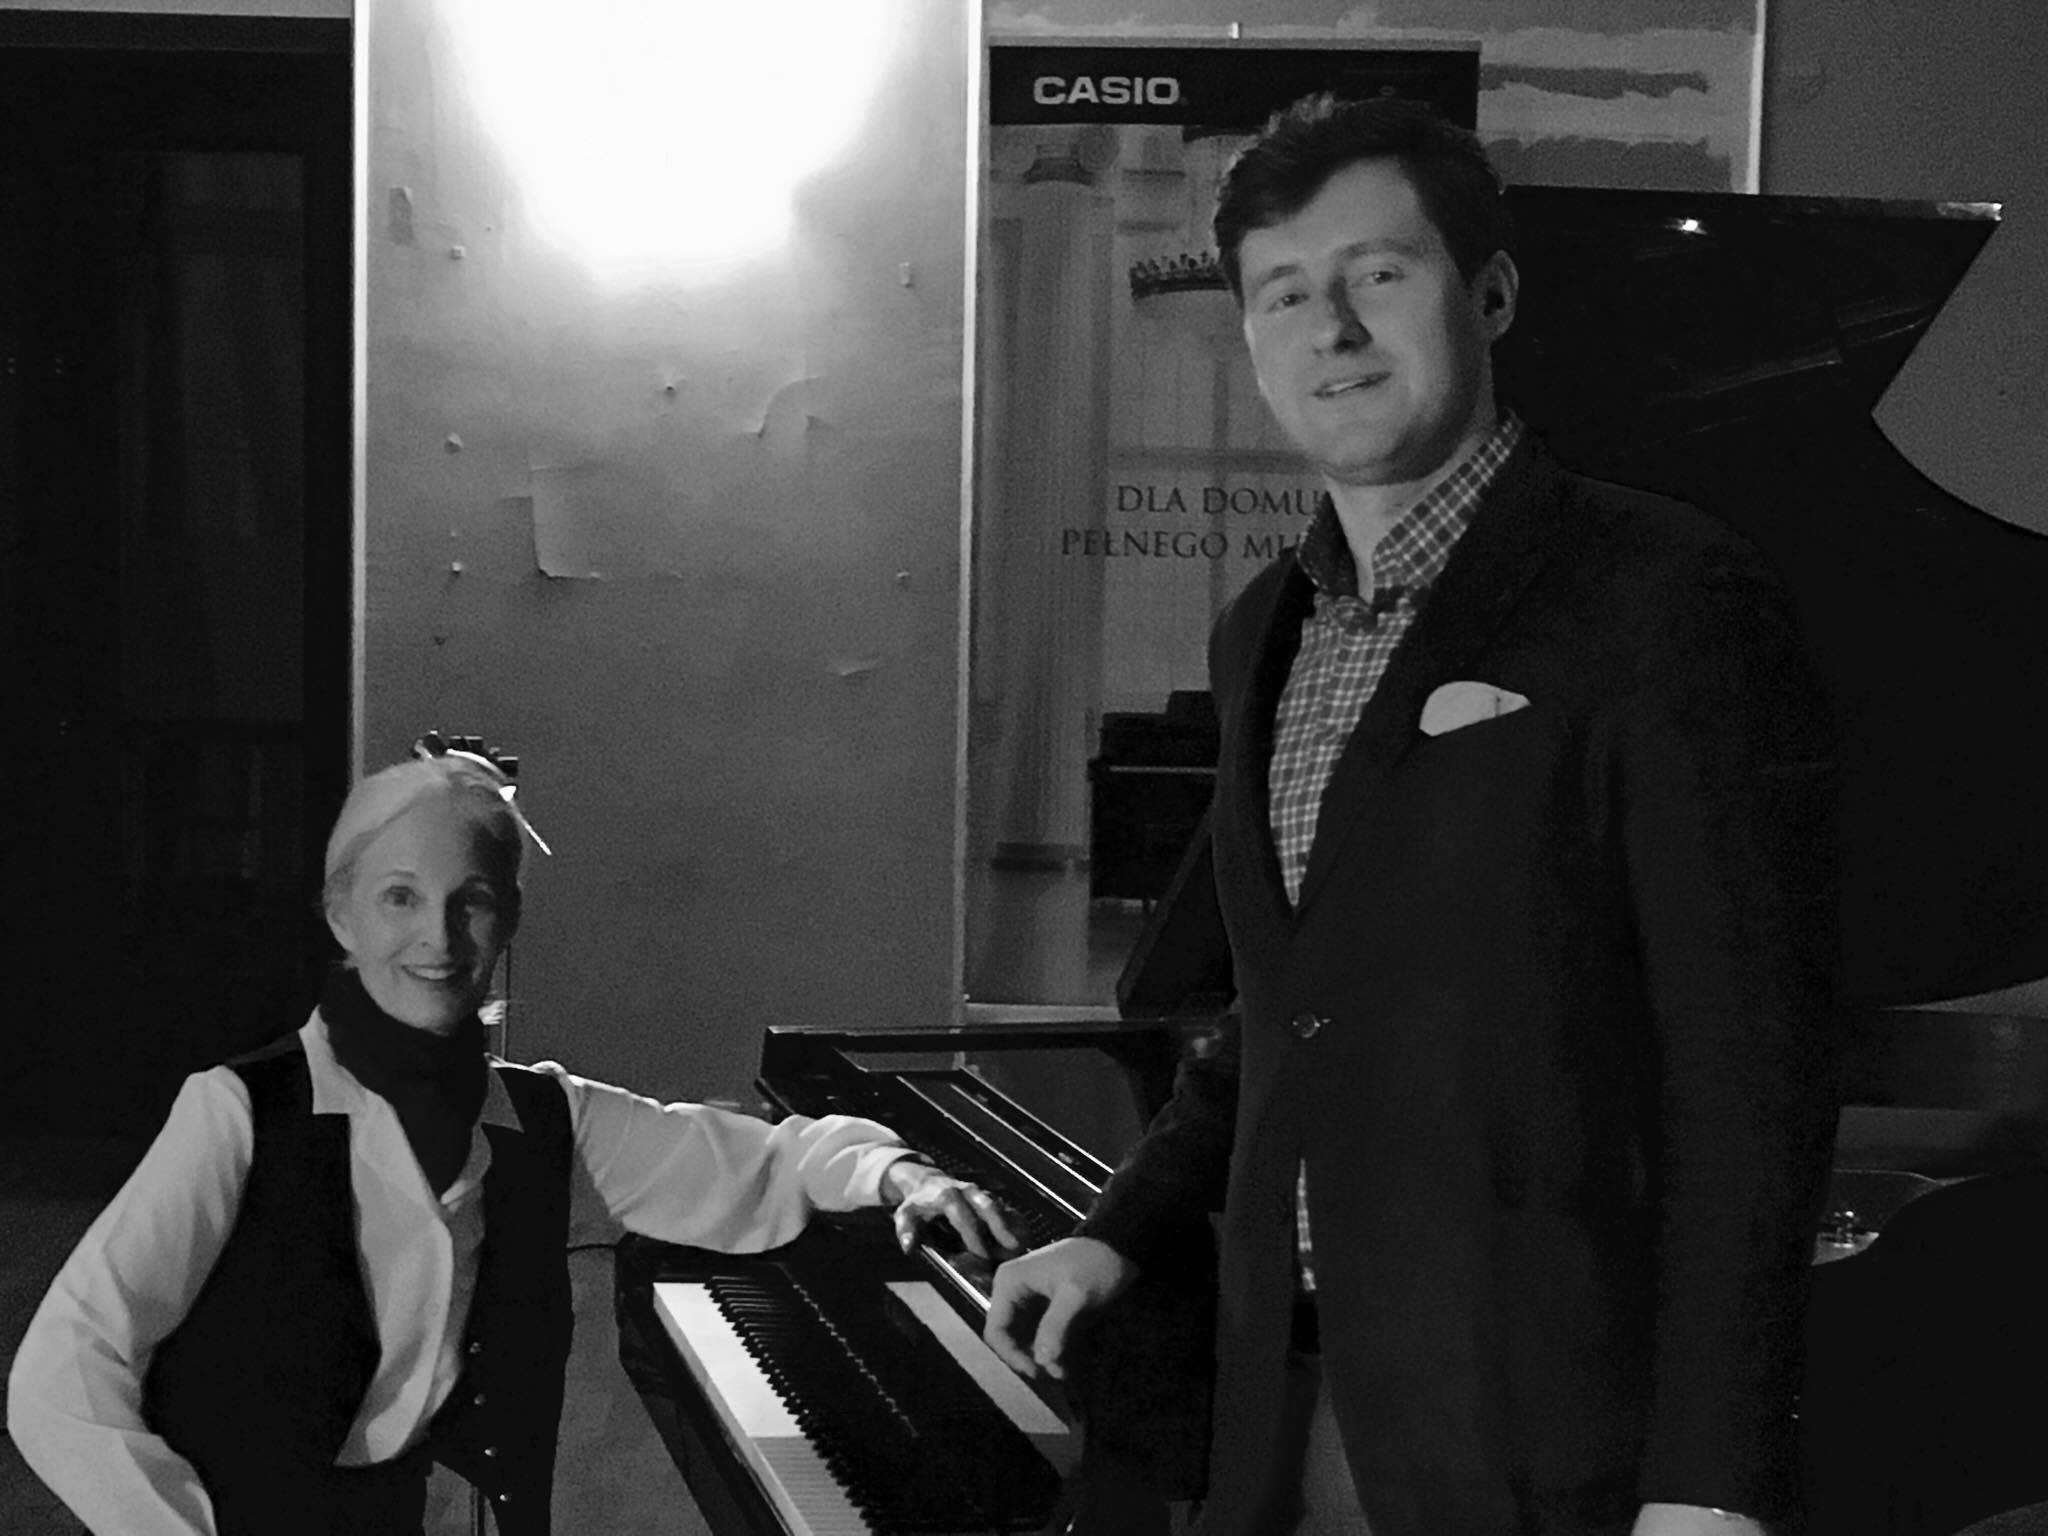 Pam as Chopin/Sand after one-woman show with Polish violinist Mareusz Strzelecki, February 23, 2017.